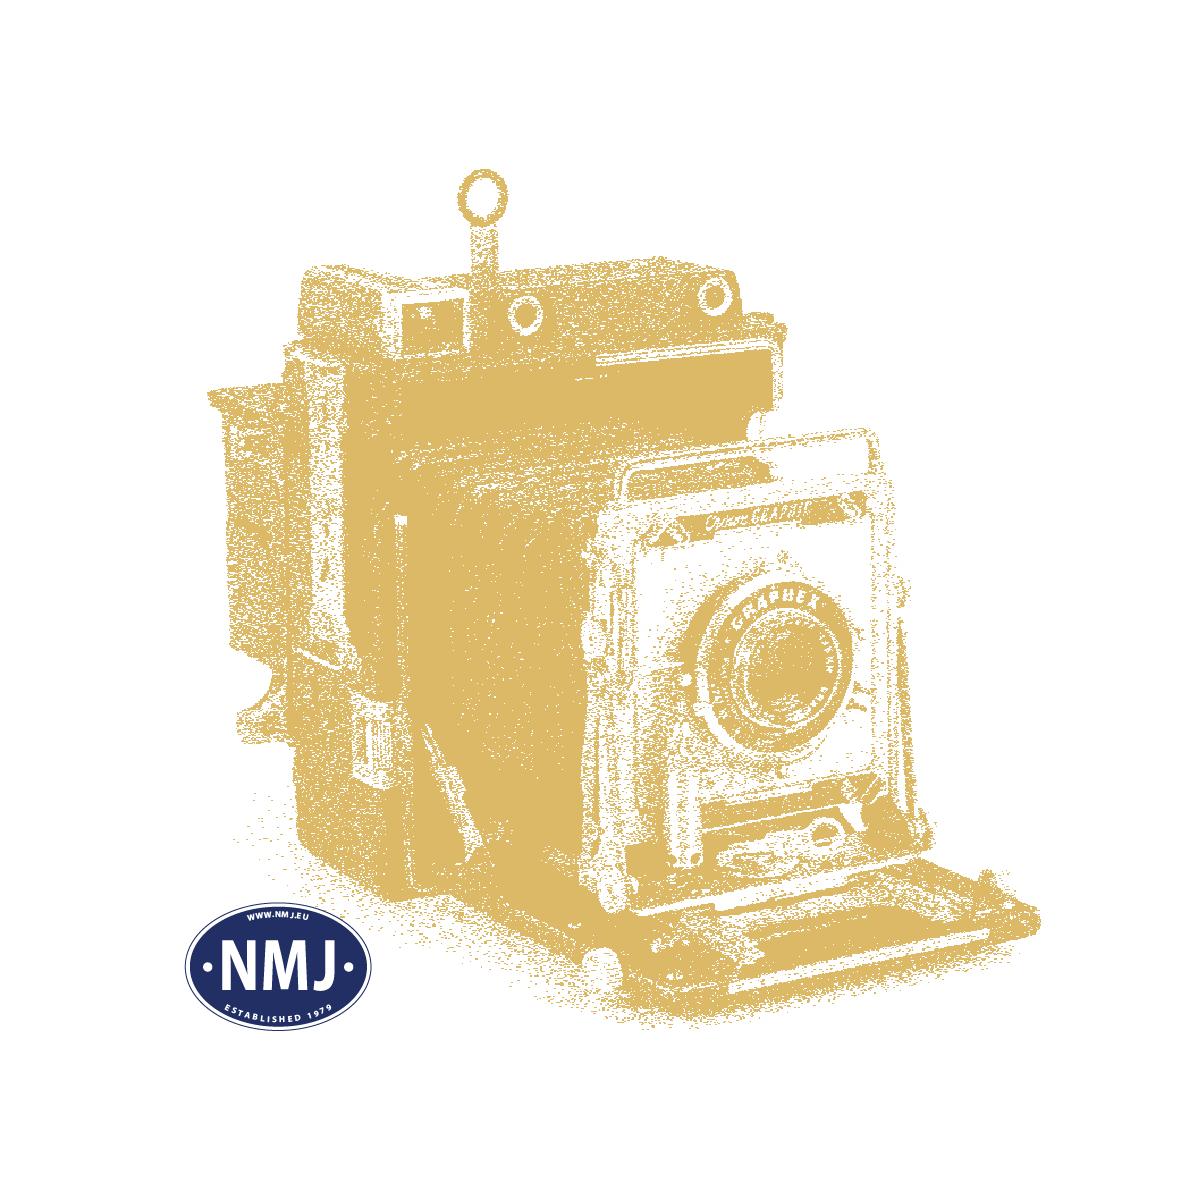 NMJT95401 - NMJ Topline SNCB 202020, AC m/Lyd (NMJT96401)